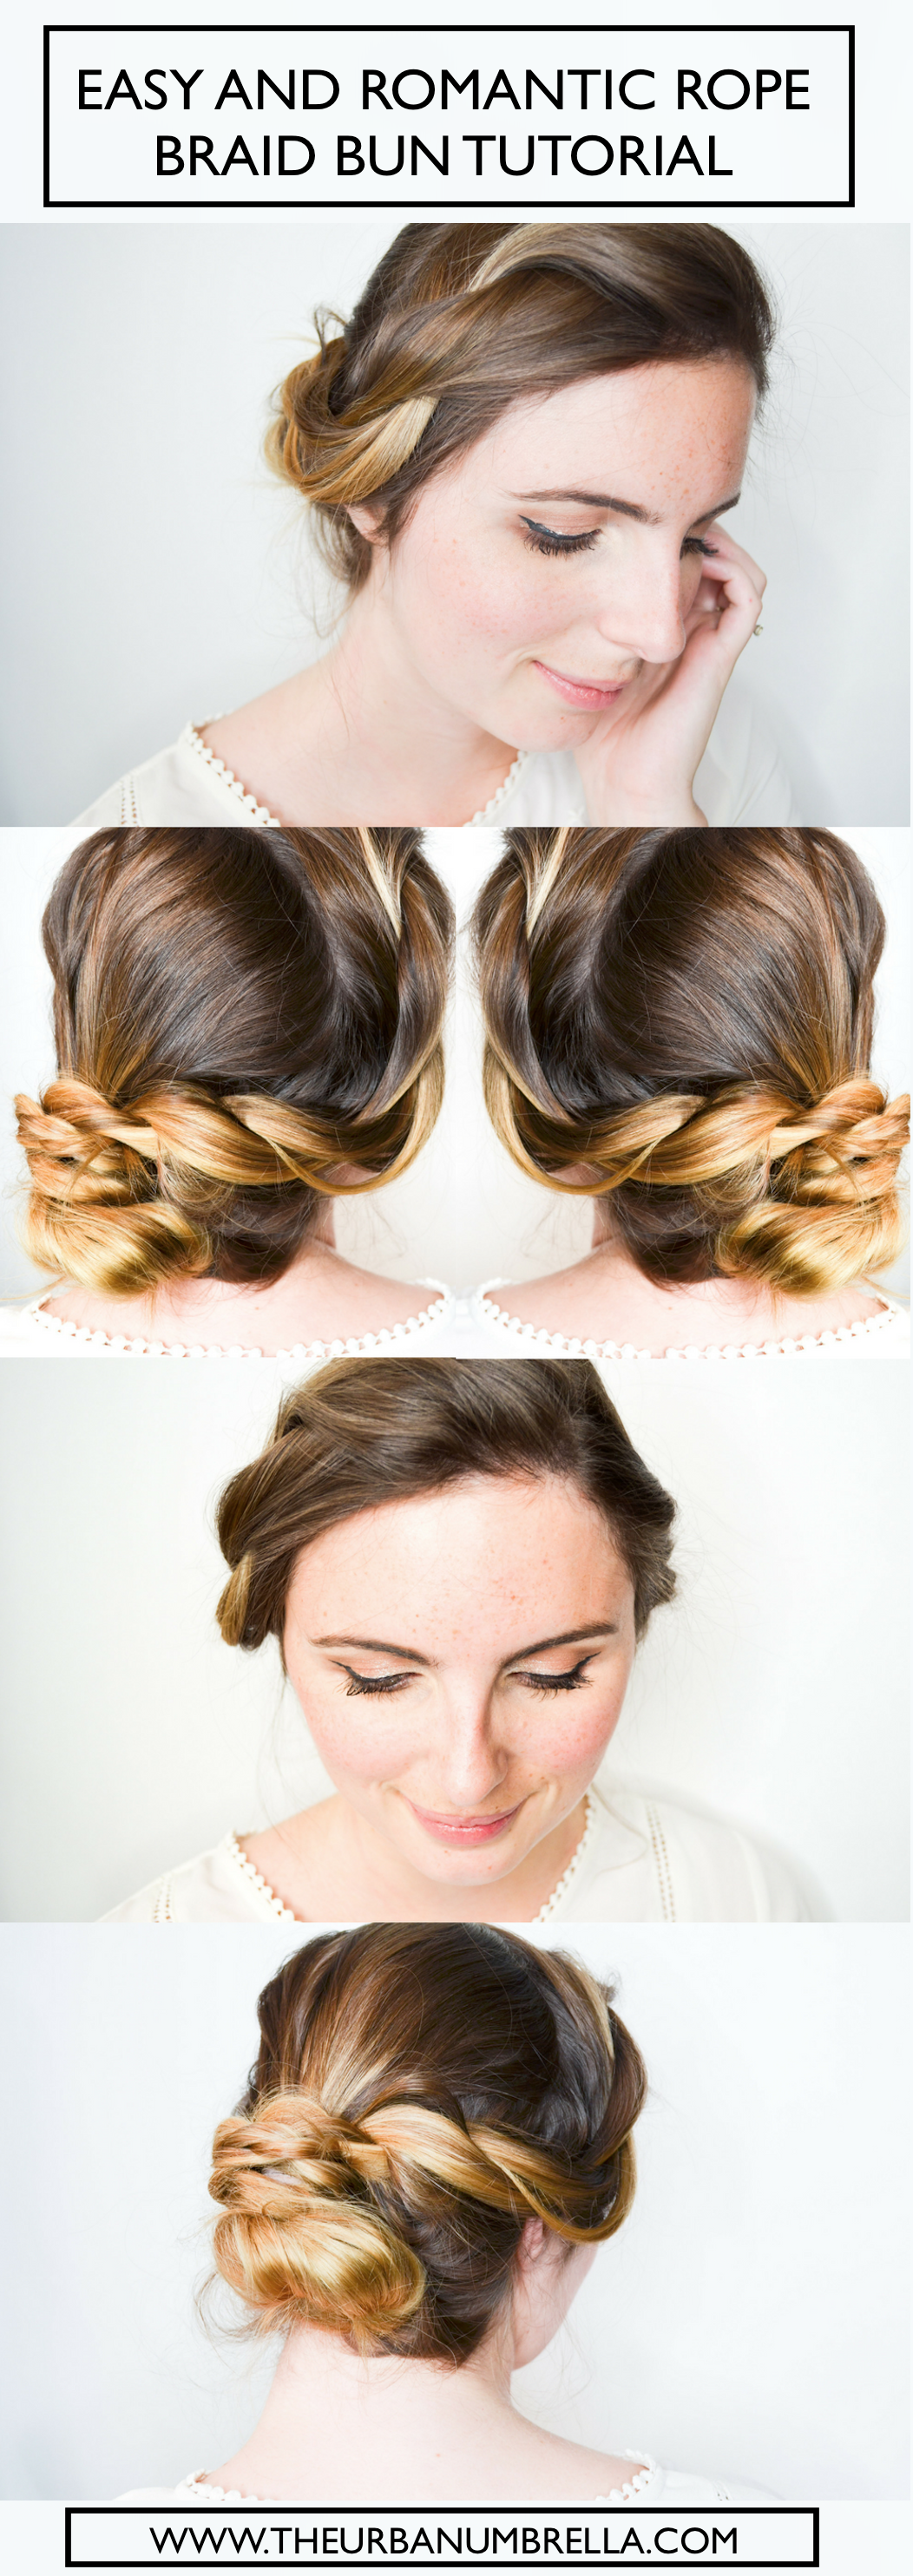 Easy and romantic rope braid bun tutorial braided bun tutorials